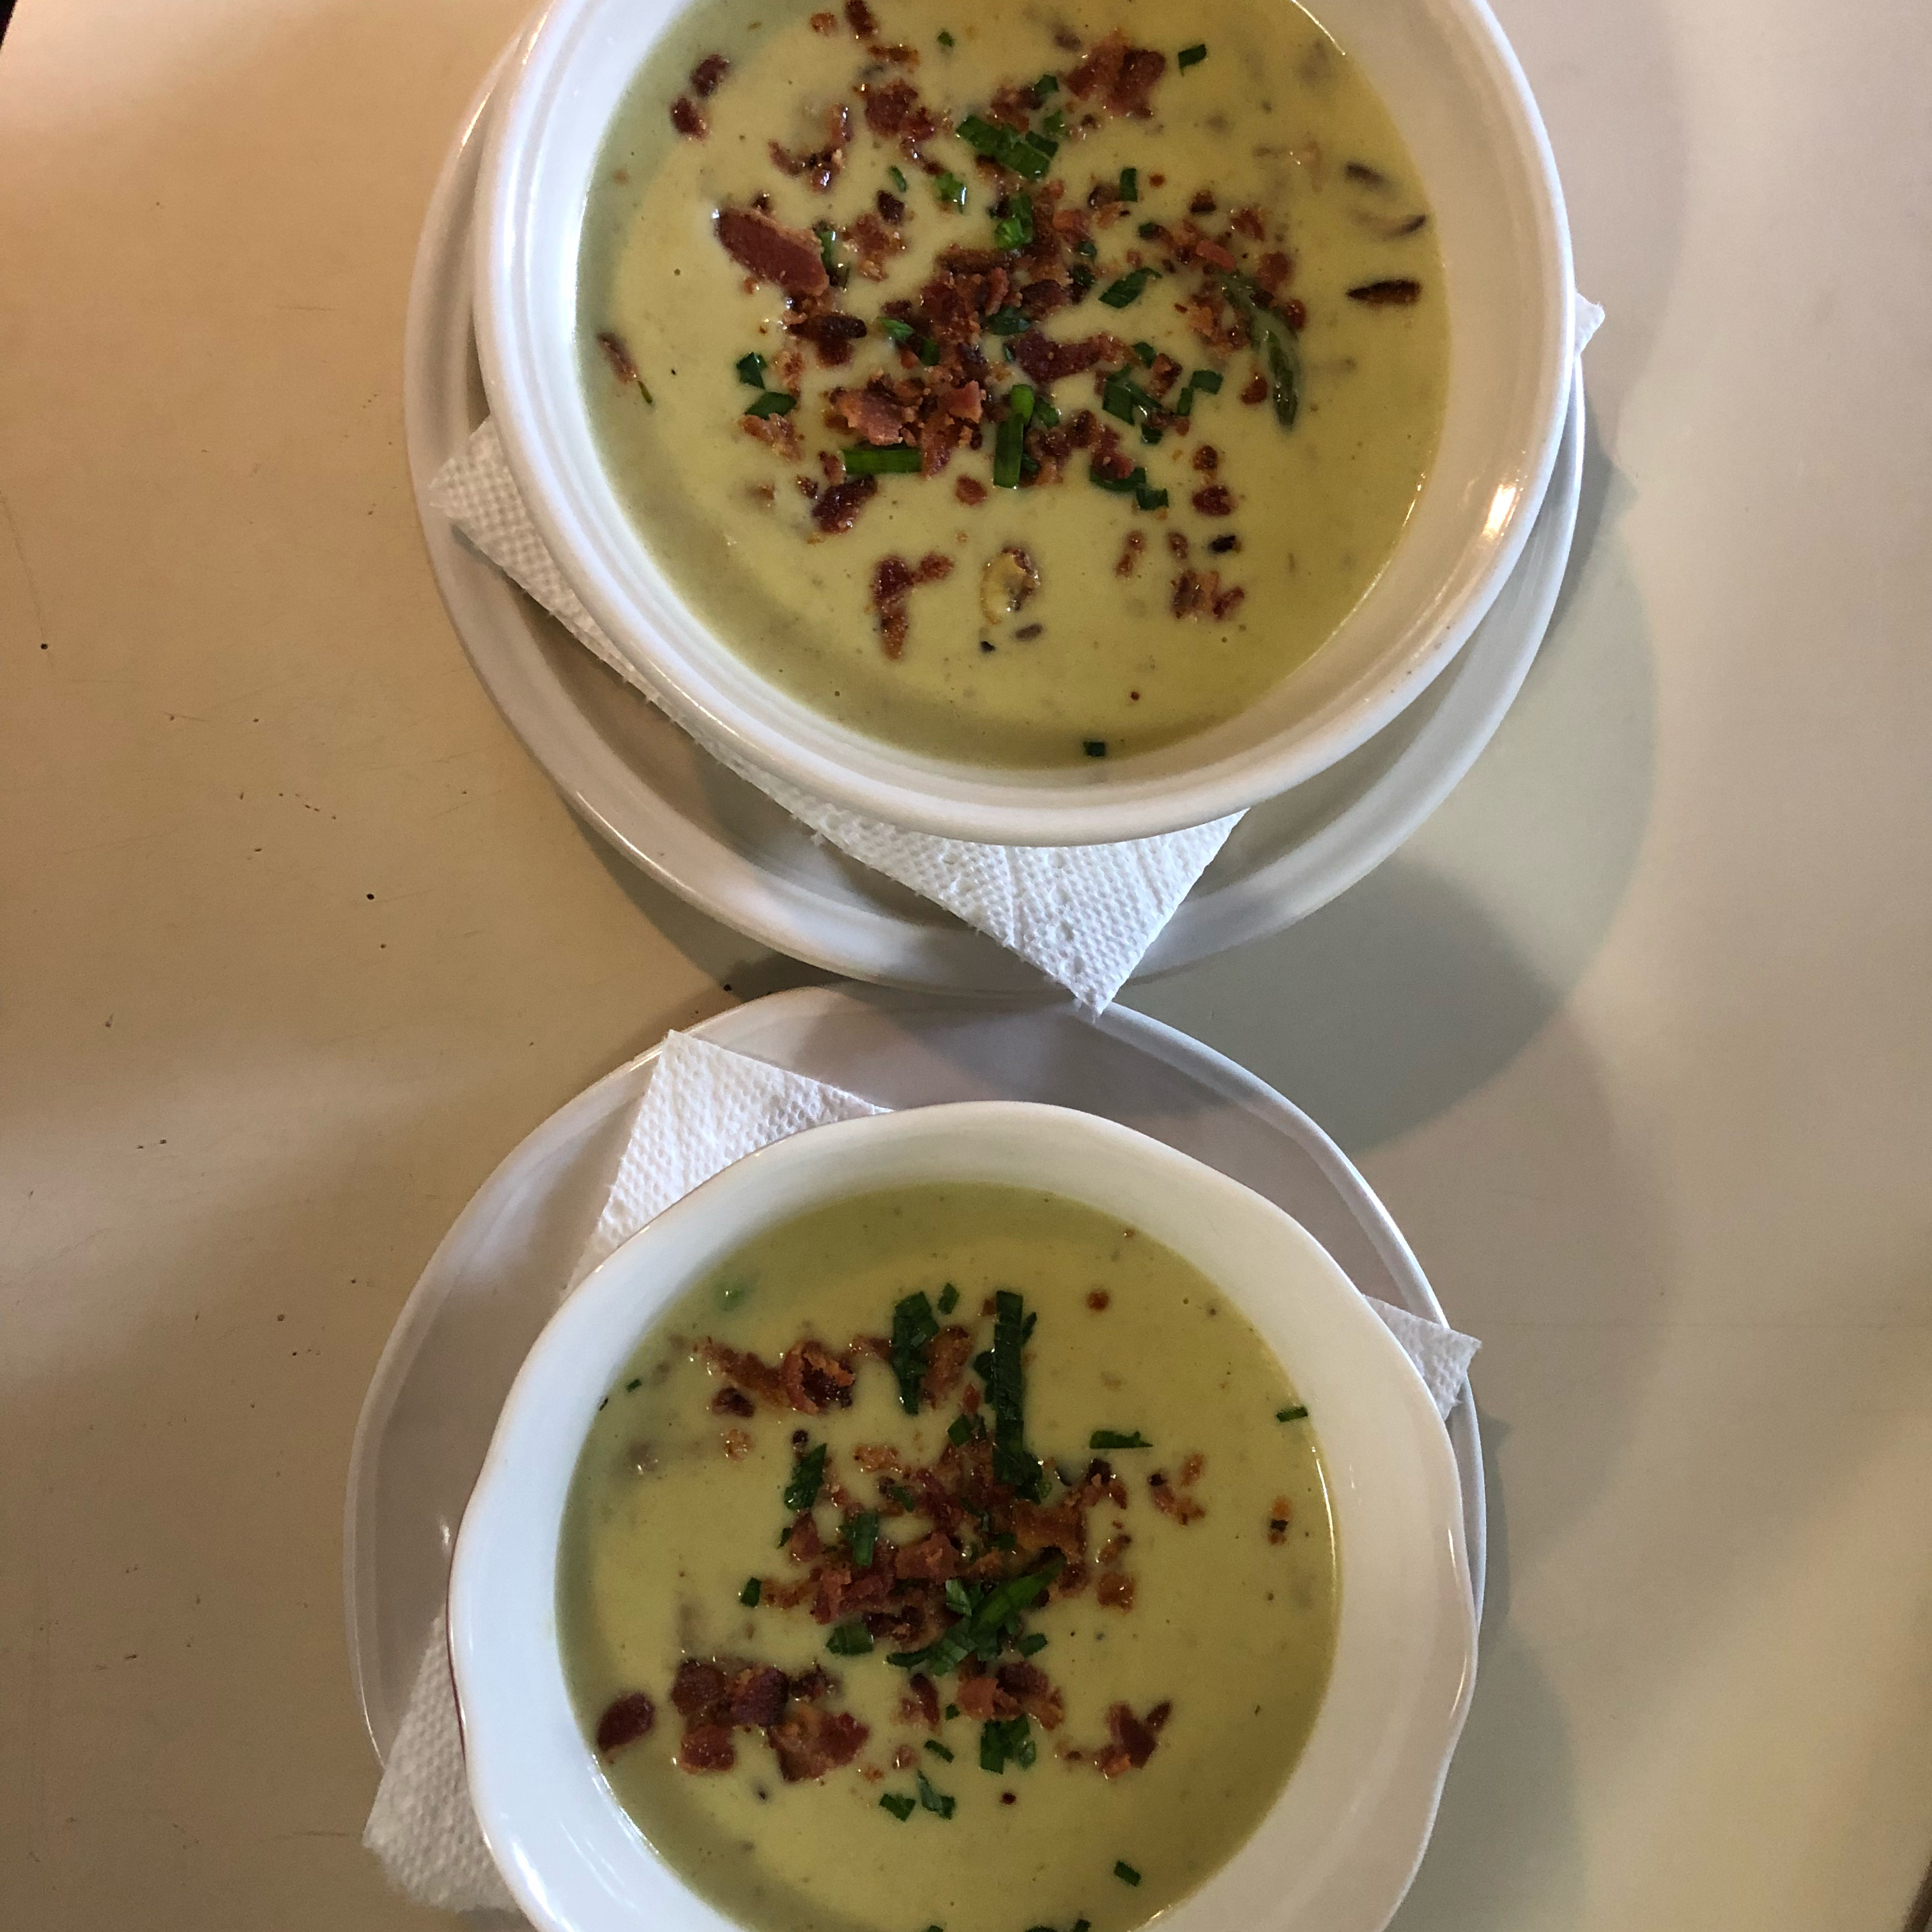 Cream of Asparagus and Mushroom Soup